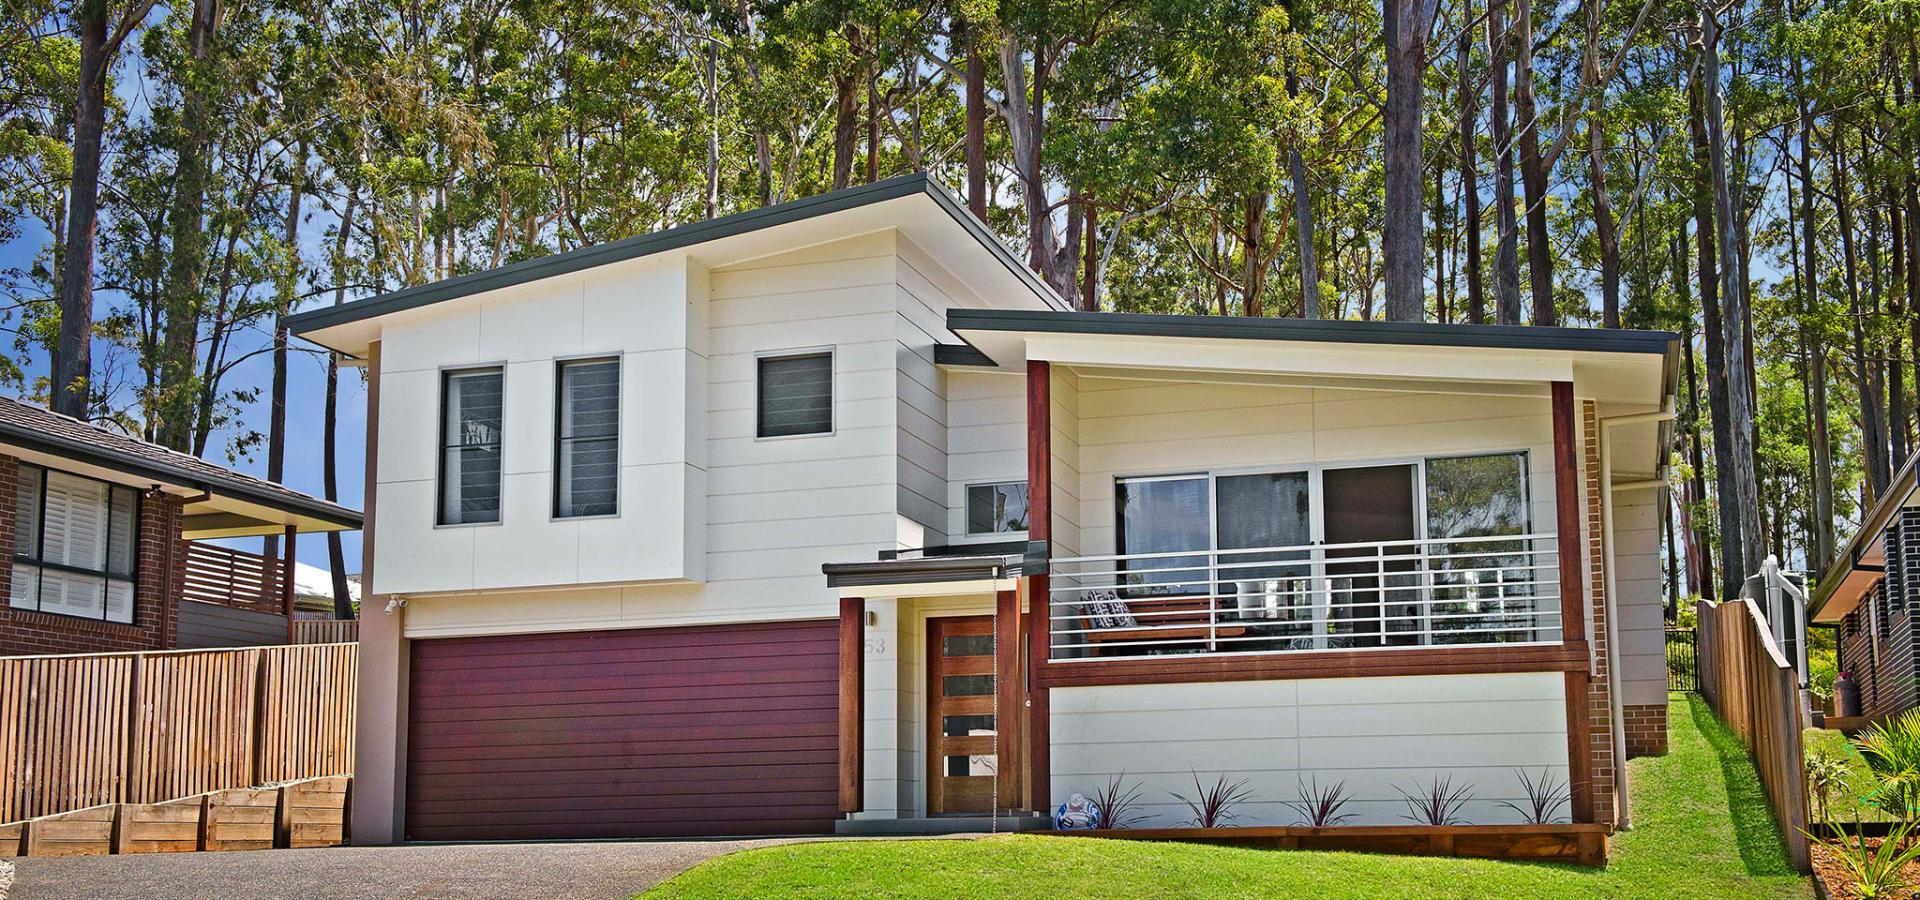 Uniquely Designed Family Home